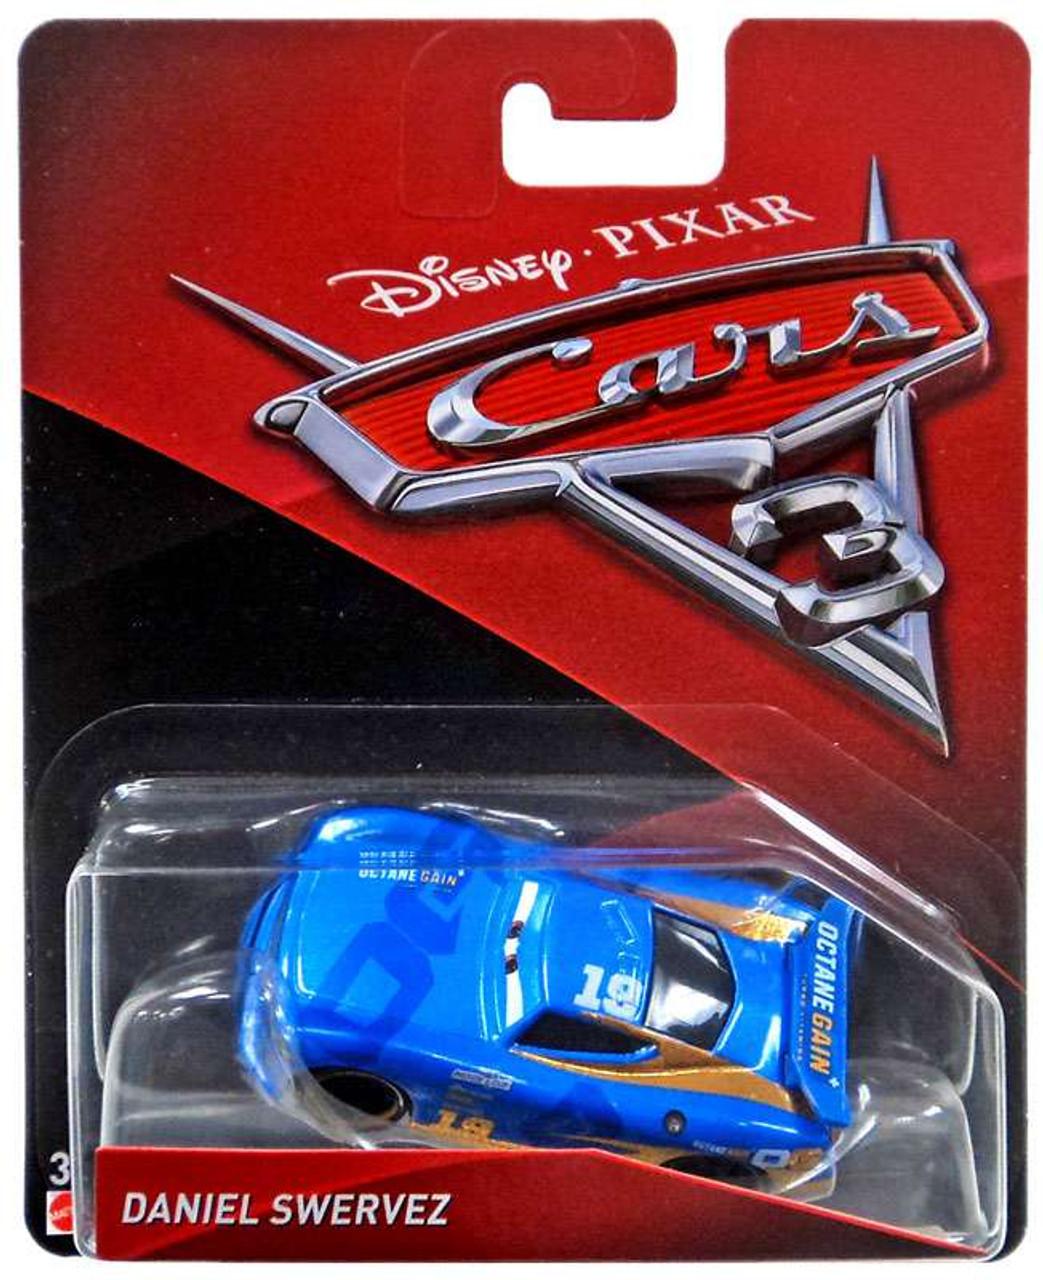 Disney Pixar Cars Cars 3 Daniel Swervez 155 Diecast Car Mattel Toys